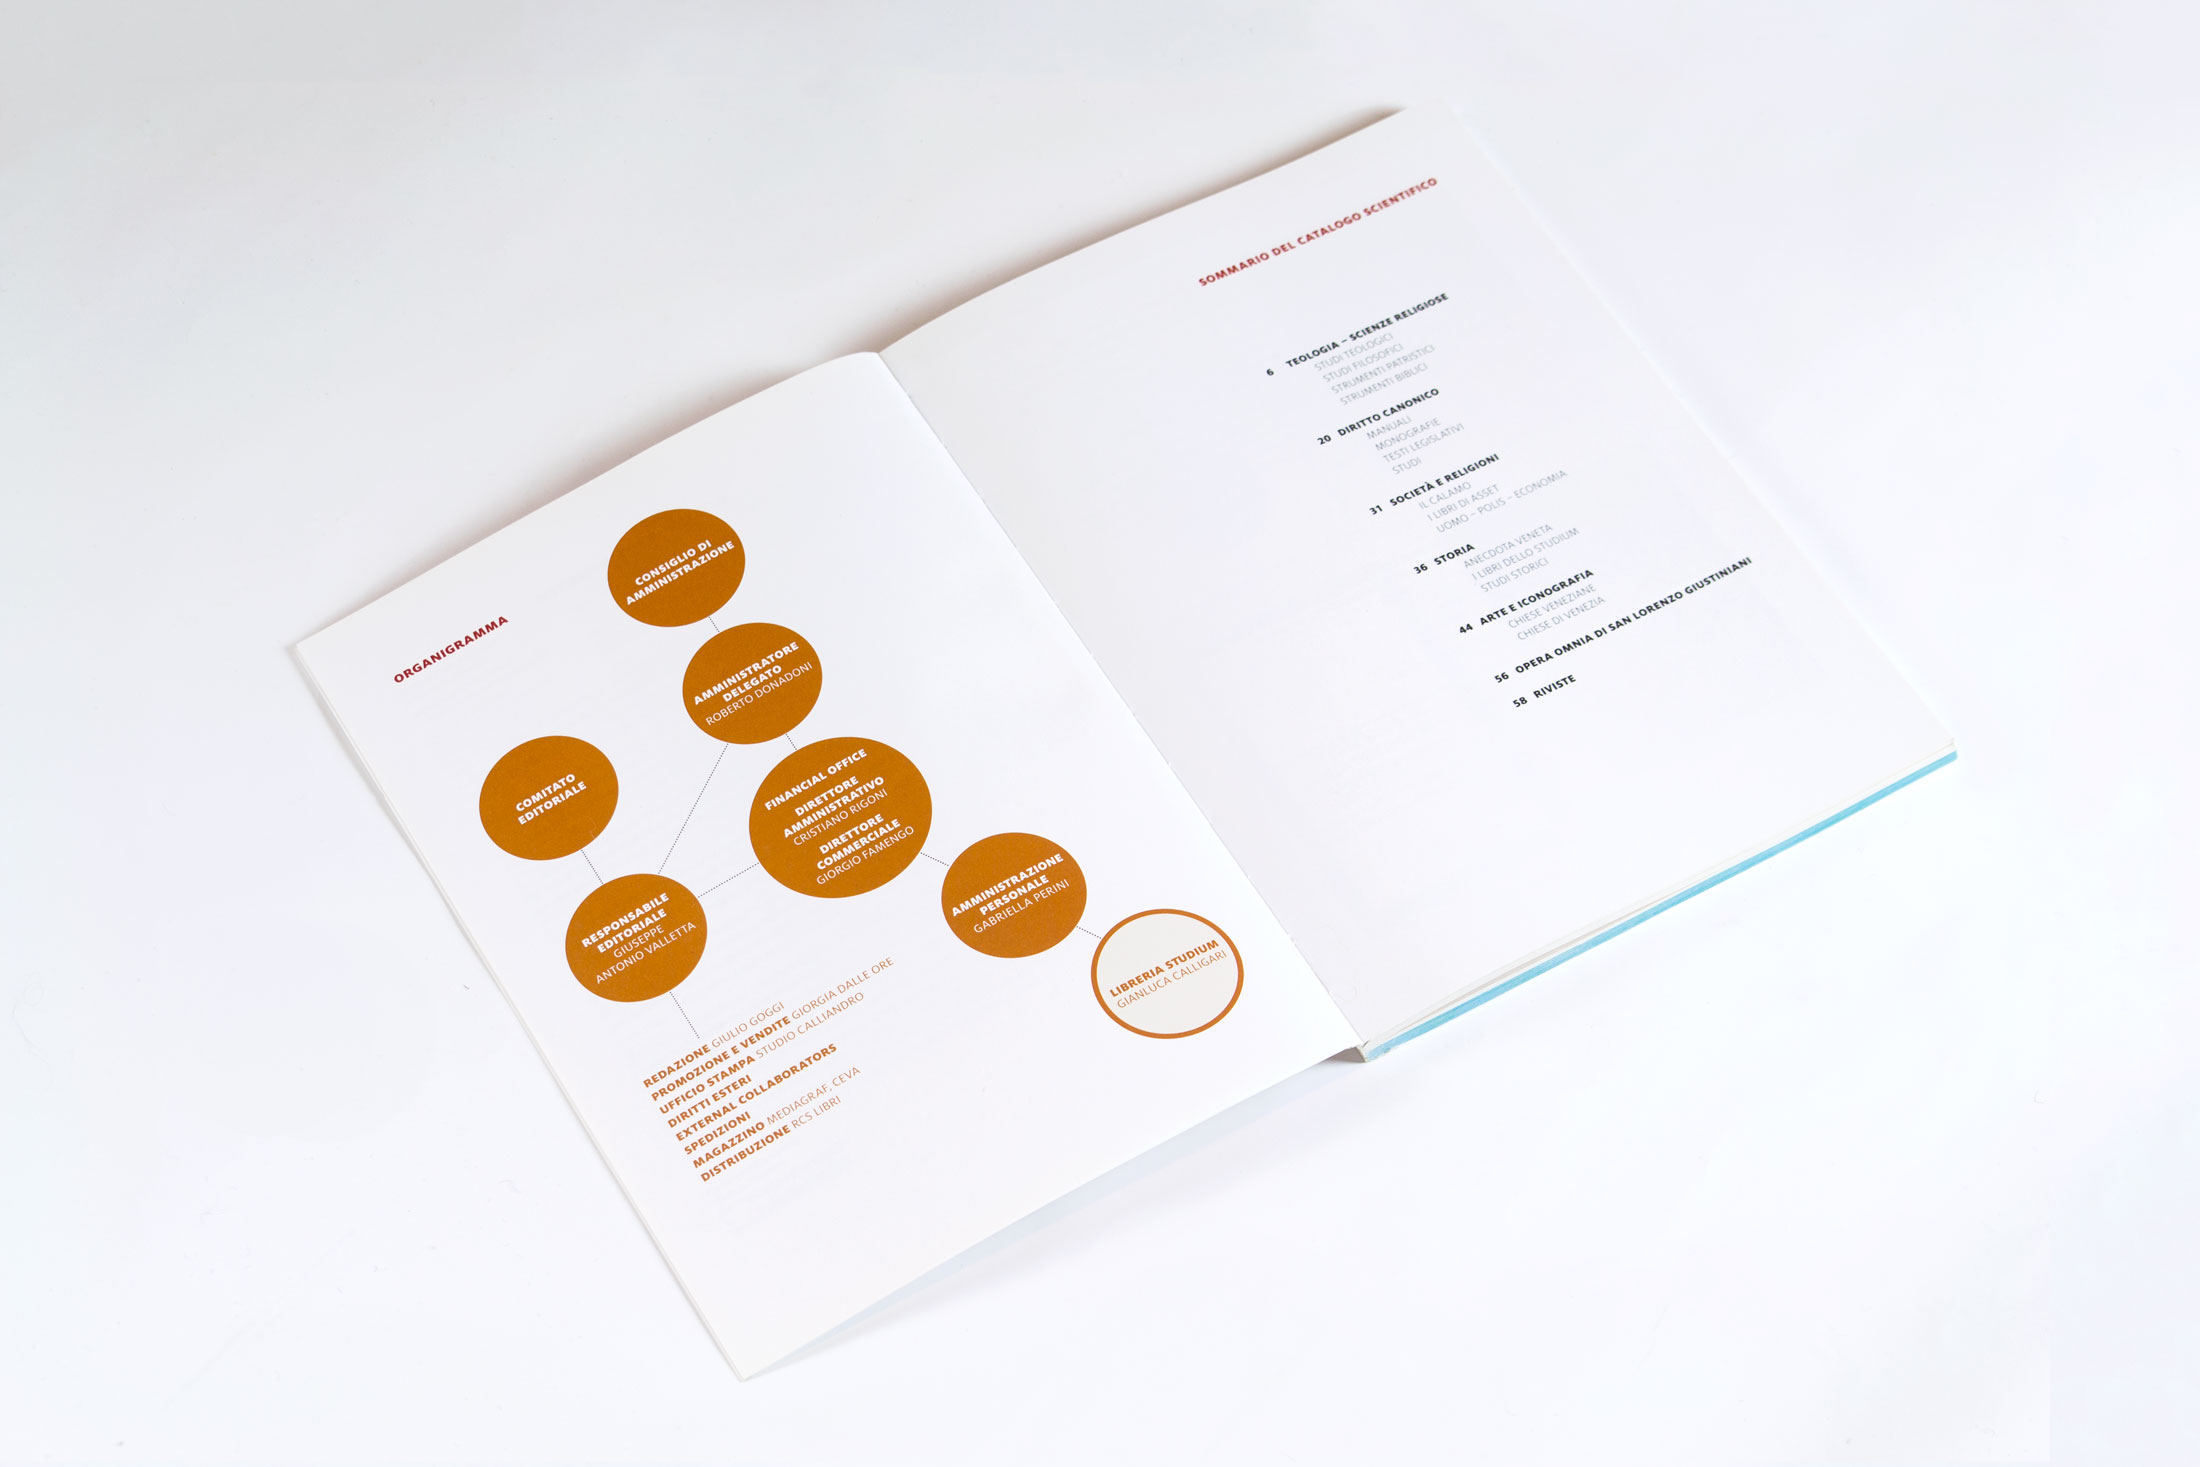 Catalogo Marcianum Press - interno 13